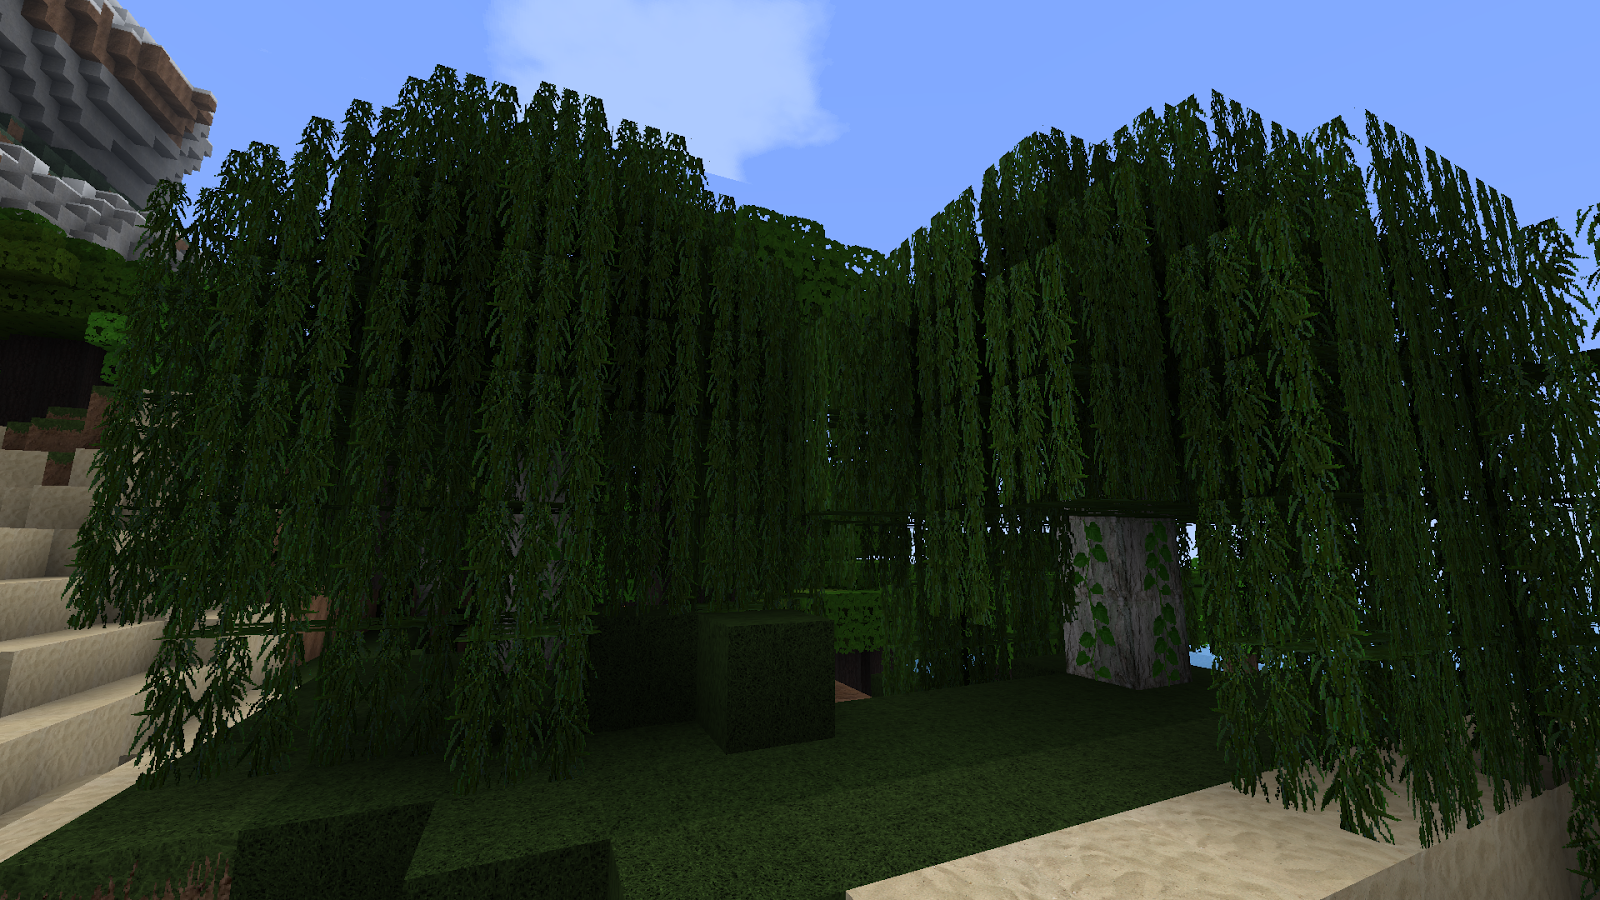 minecraft texture packs 1.11 realistic